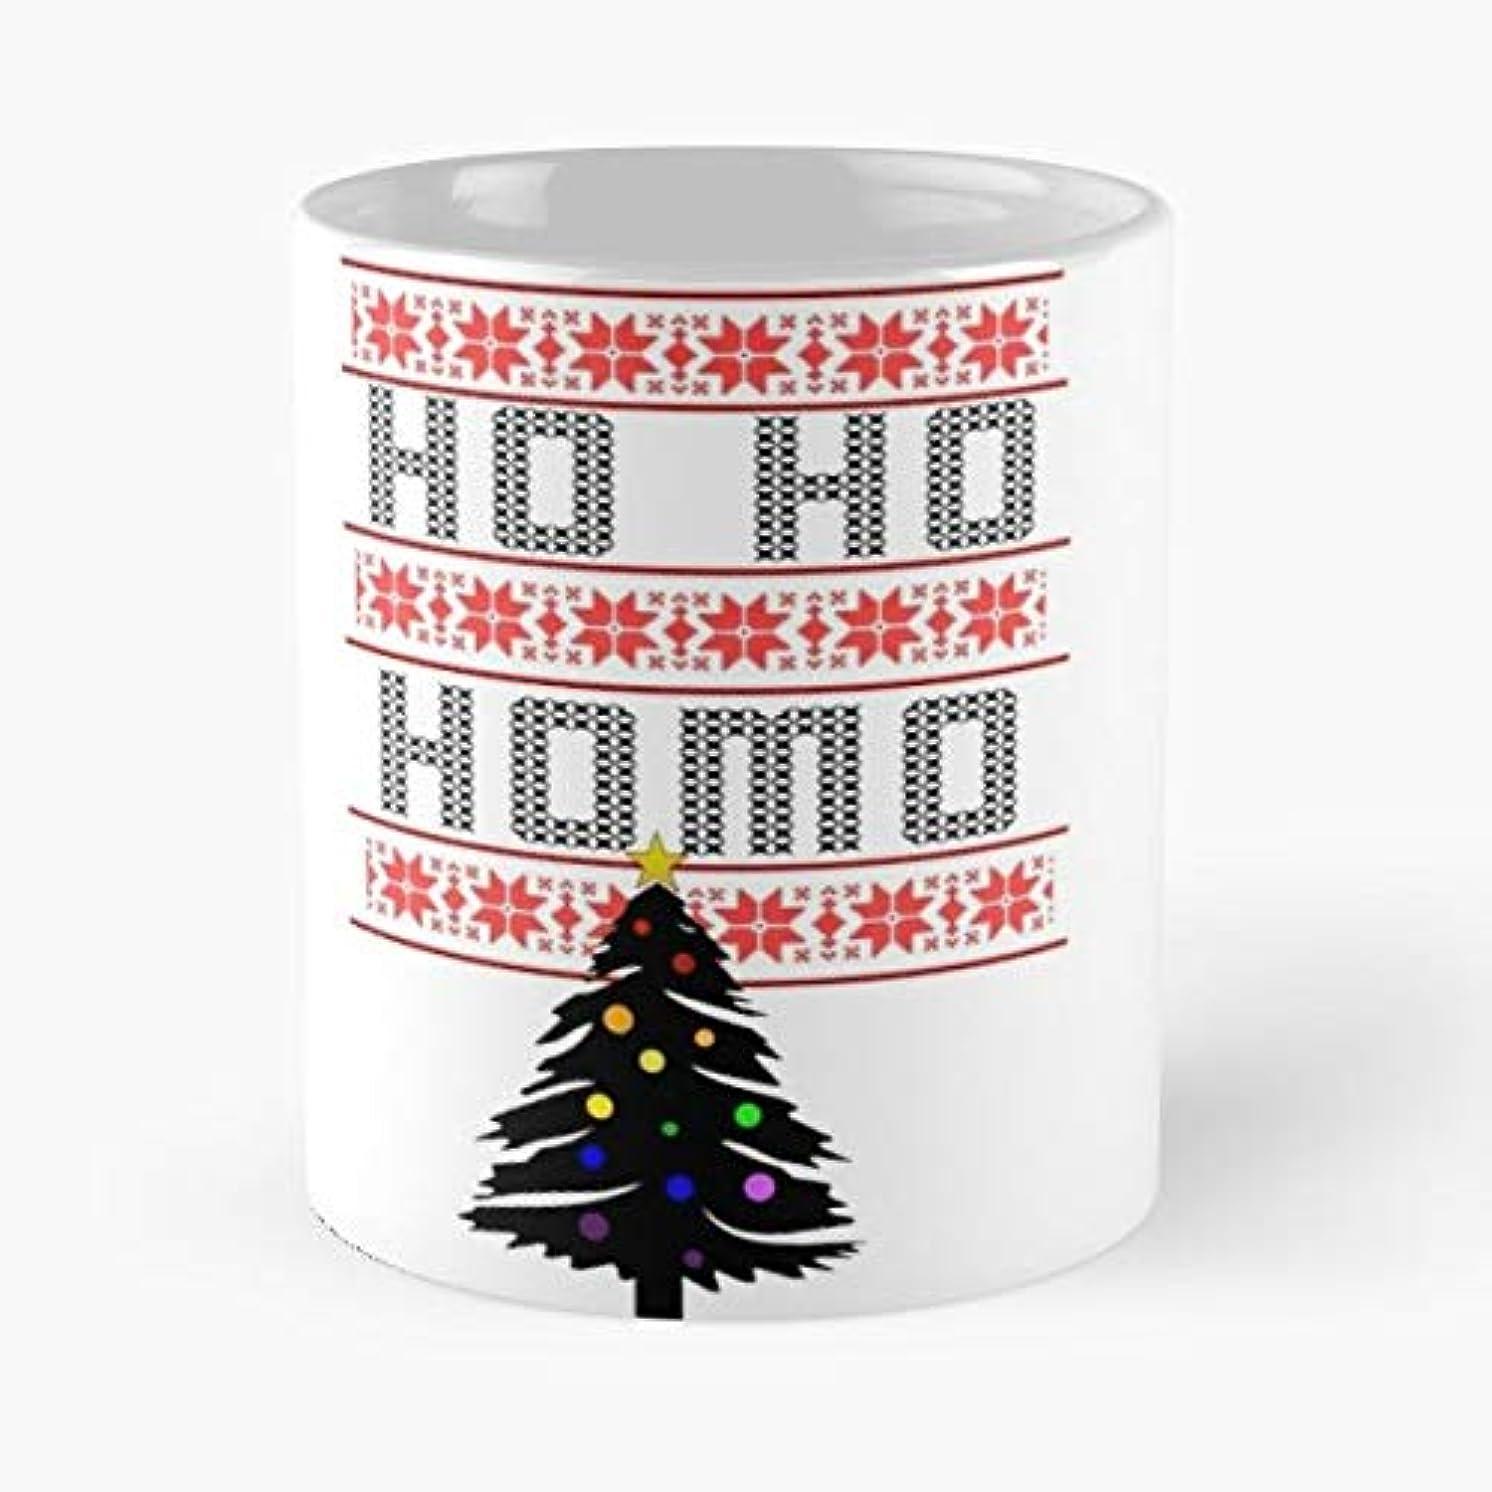 Christmas Sweater Ho Homo Gay - Handmade Funny 11oz Mug Best Holidays Gifts For Men Women Friends.